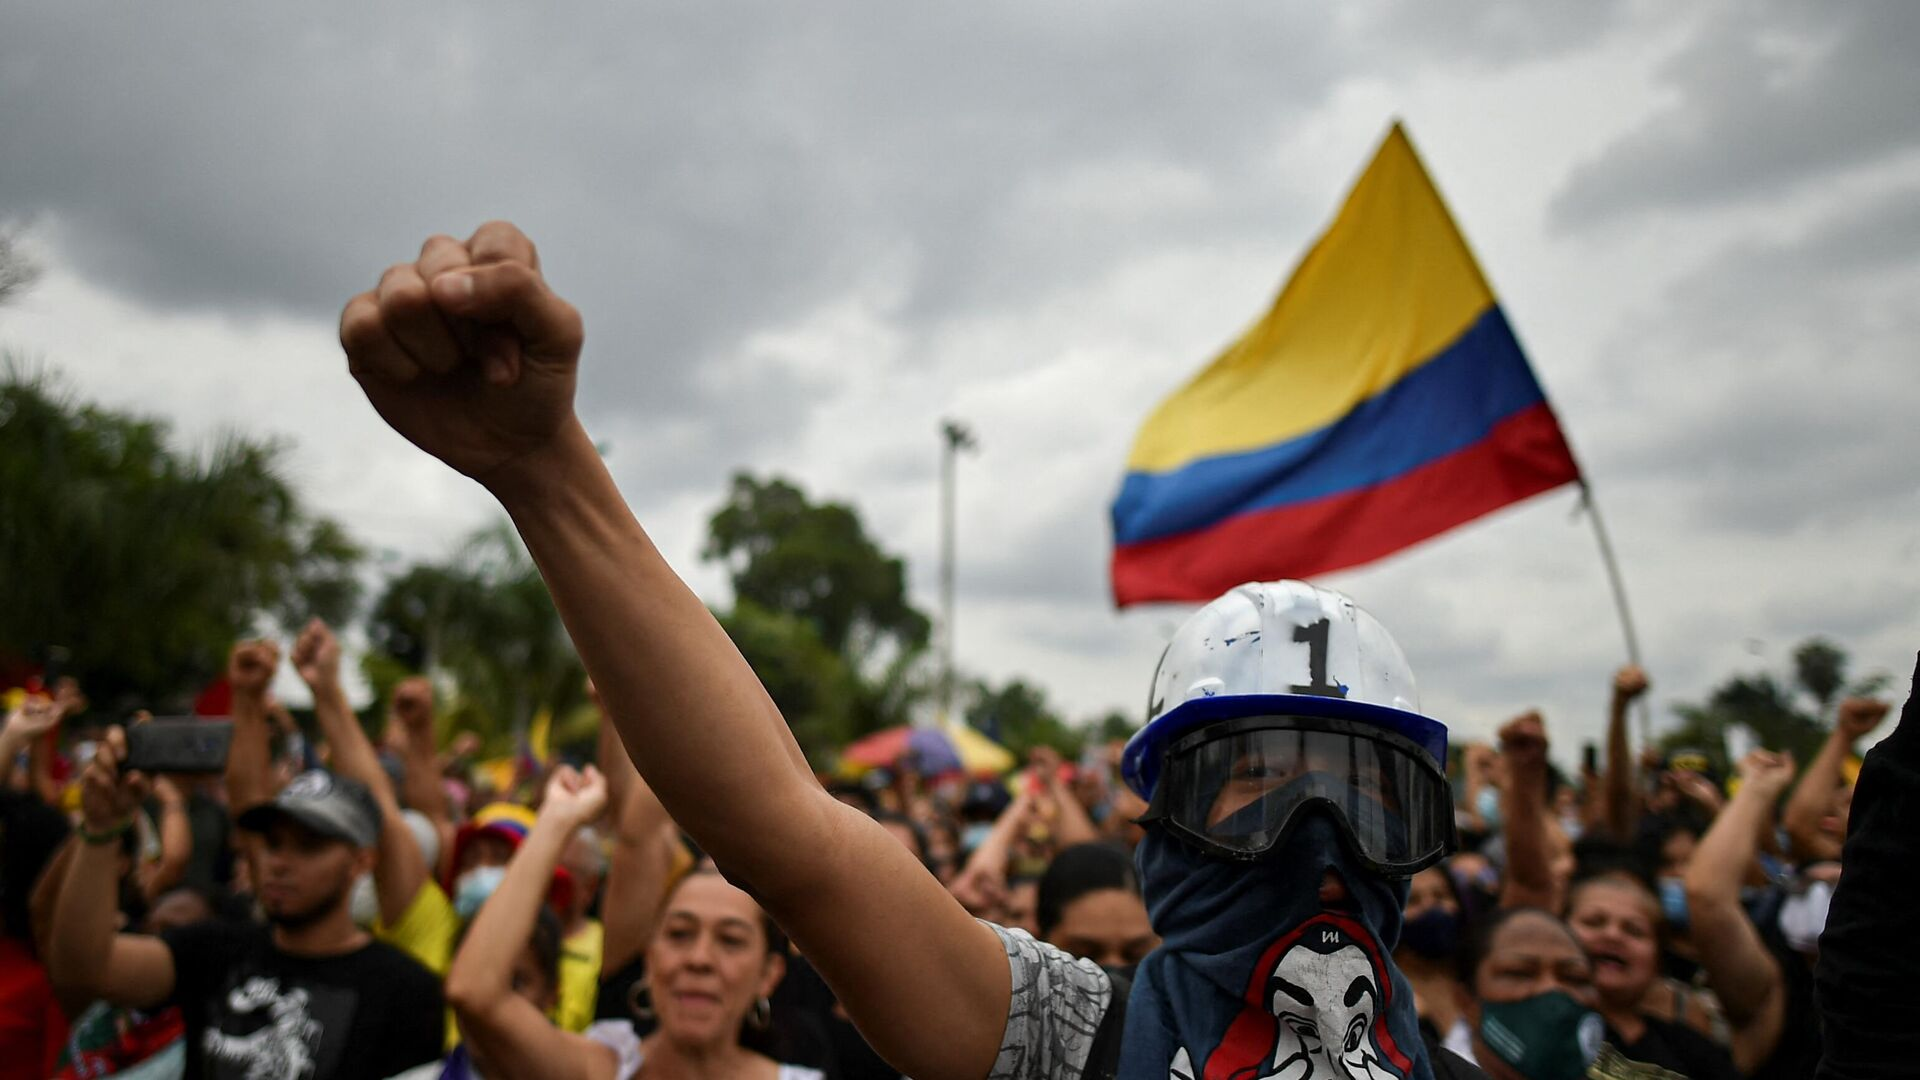 Protestas en Cali, Colombia - Sputnik Mundo, 1920, 29.09.2021